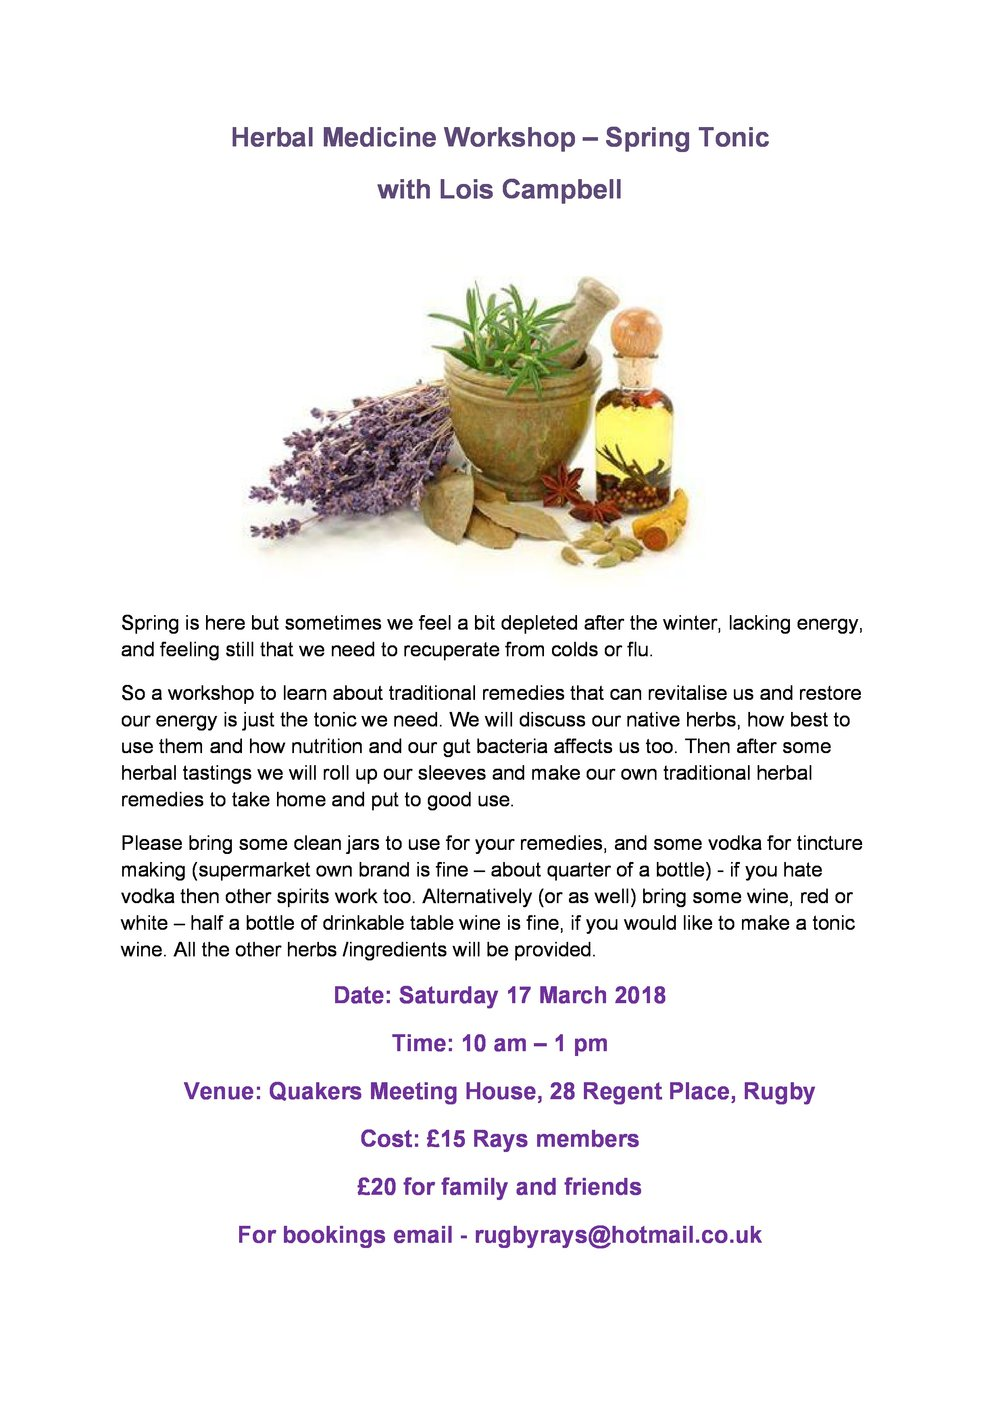 Herbal Medicine Workshop flyer.jpg